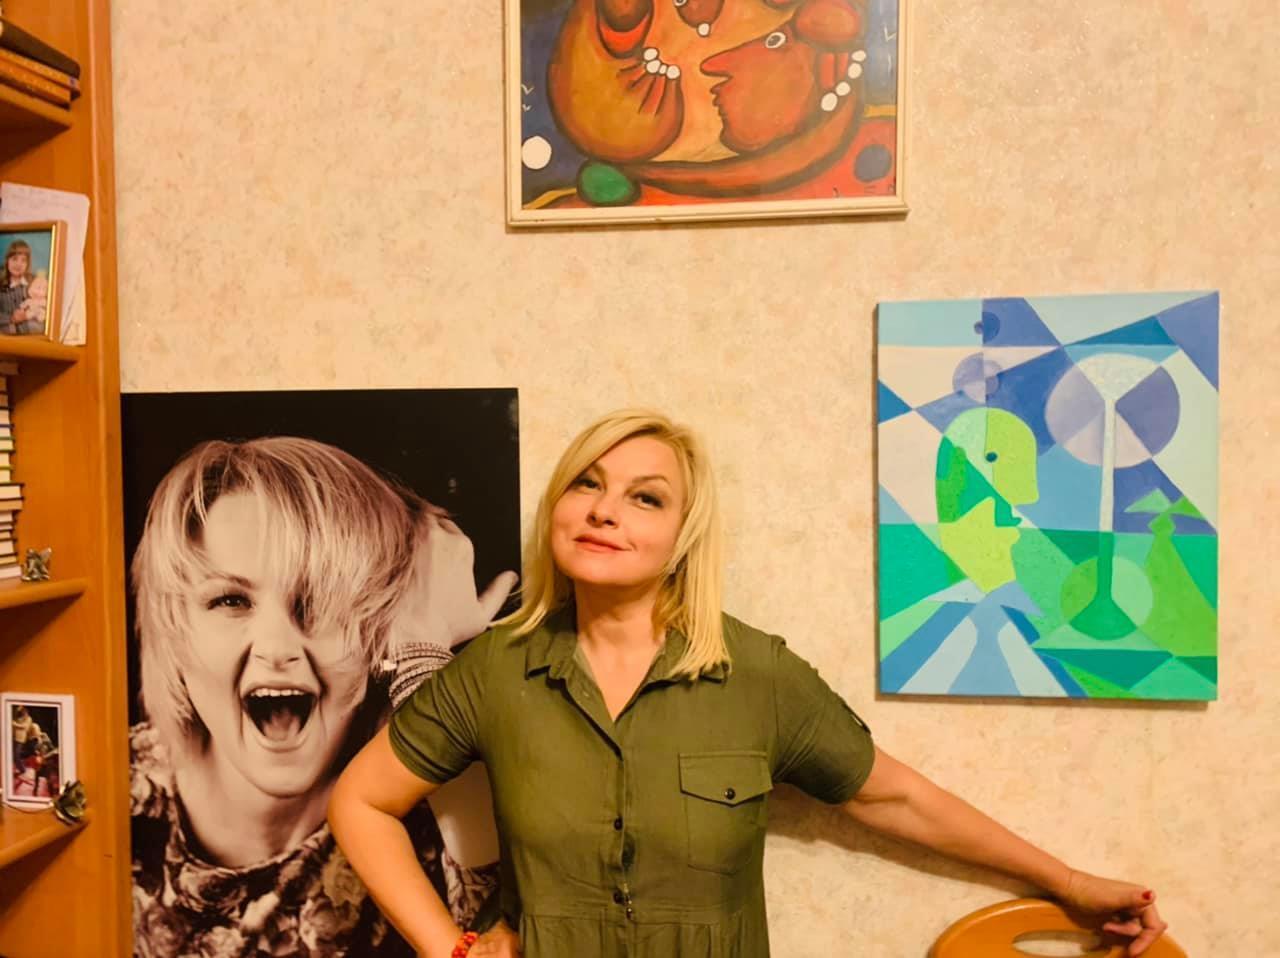 Марія Бурмака – українська співачка